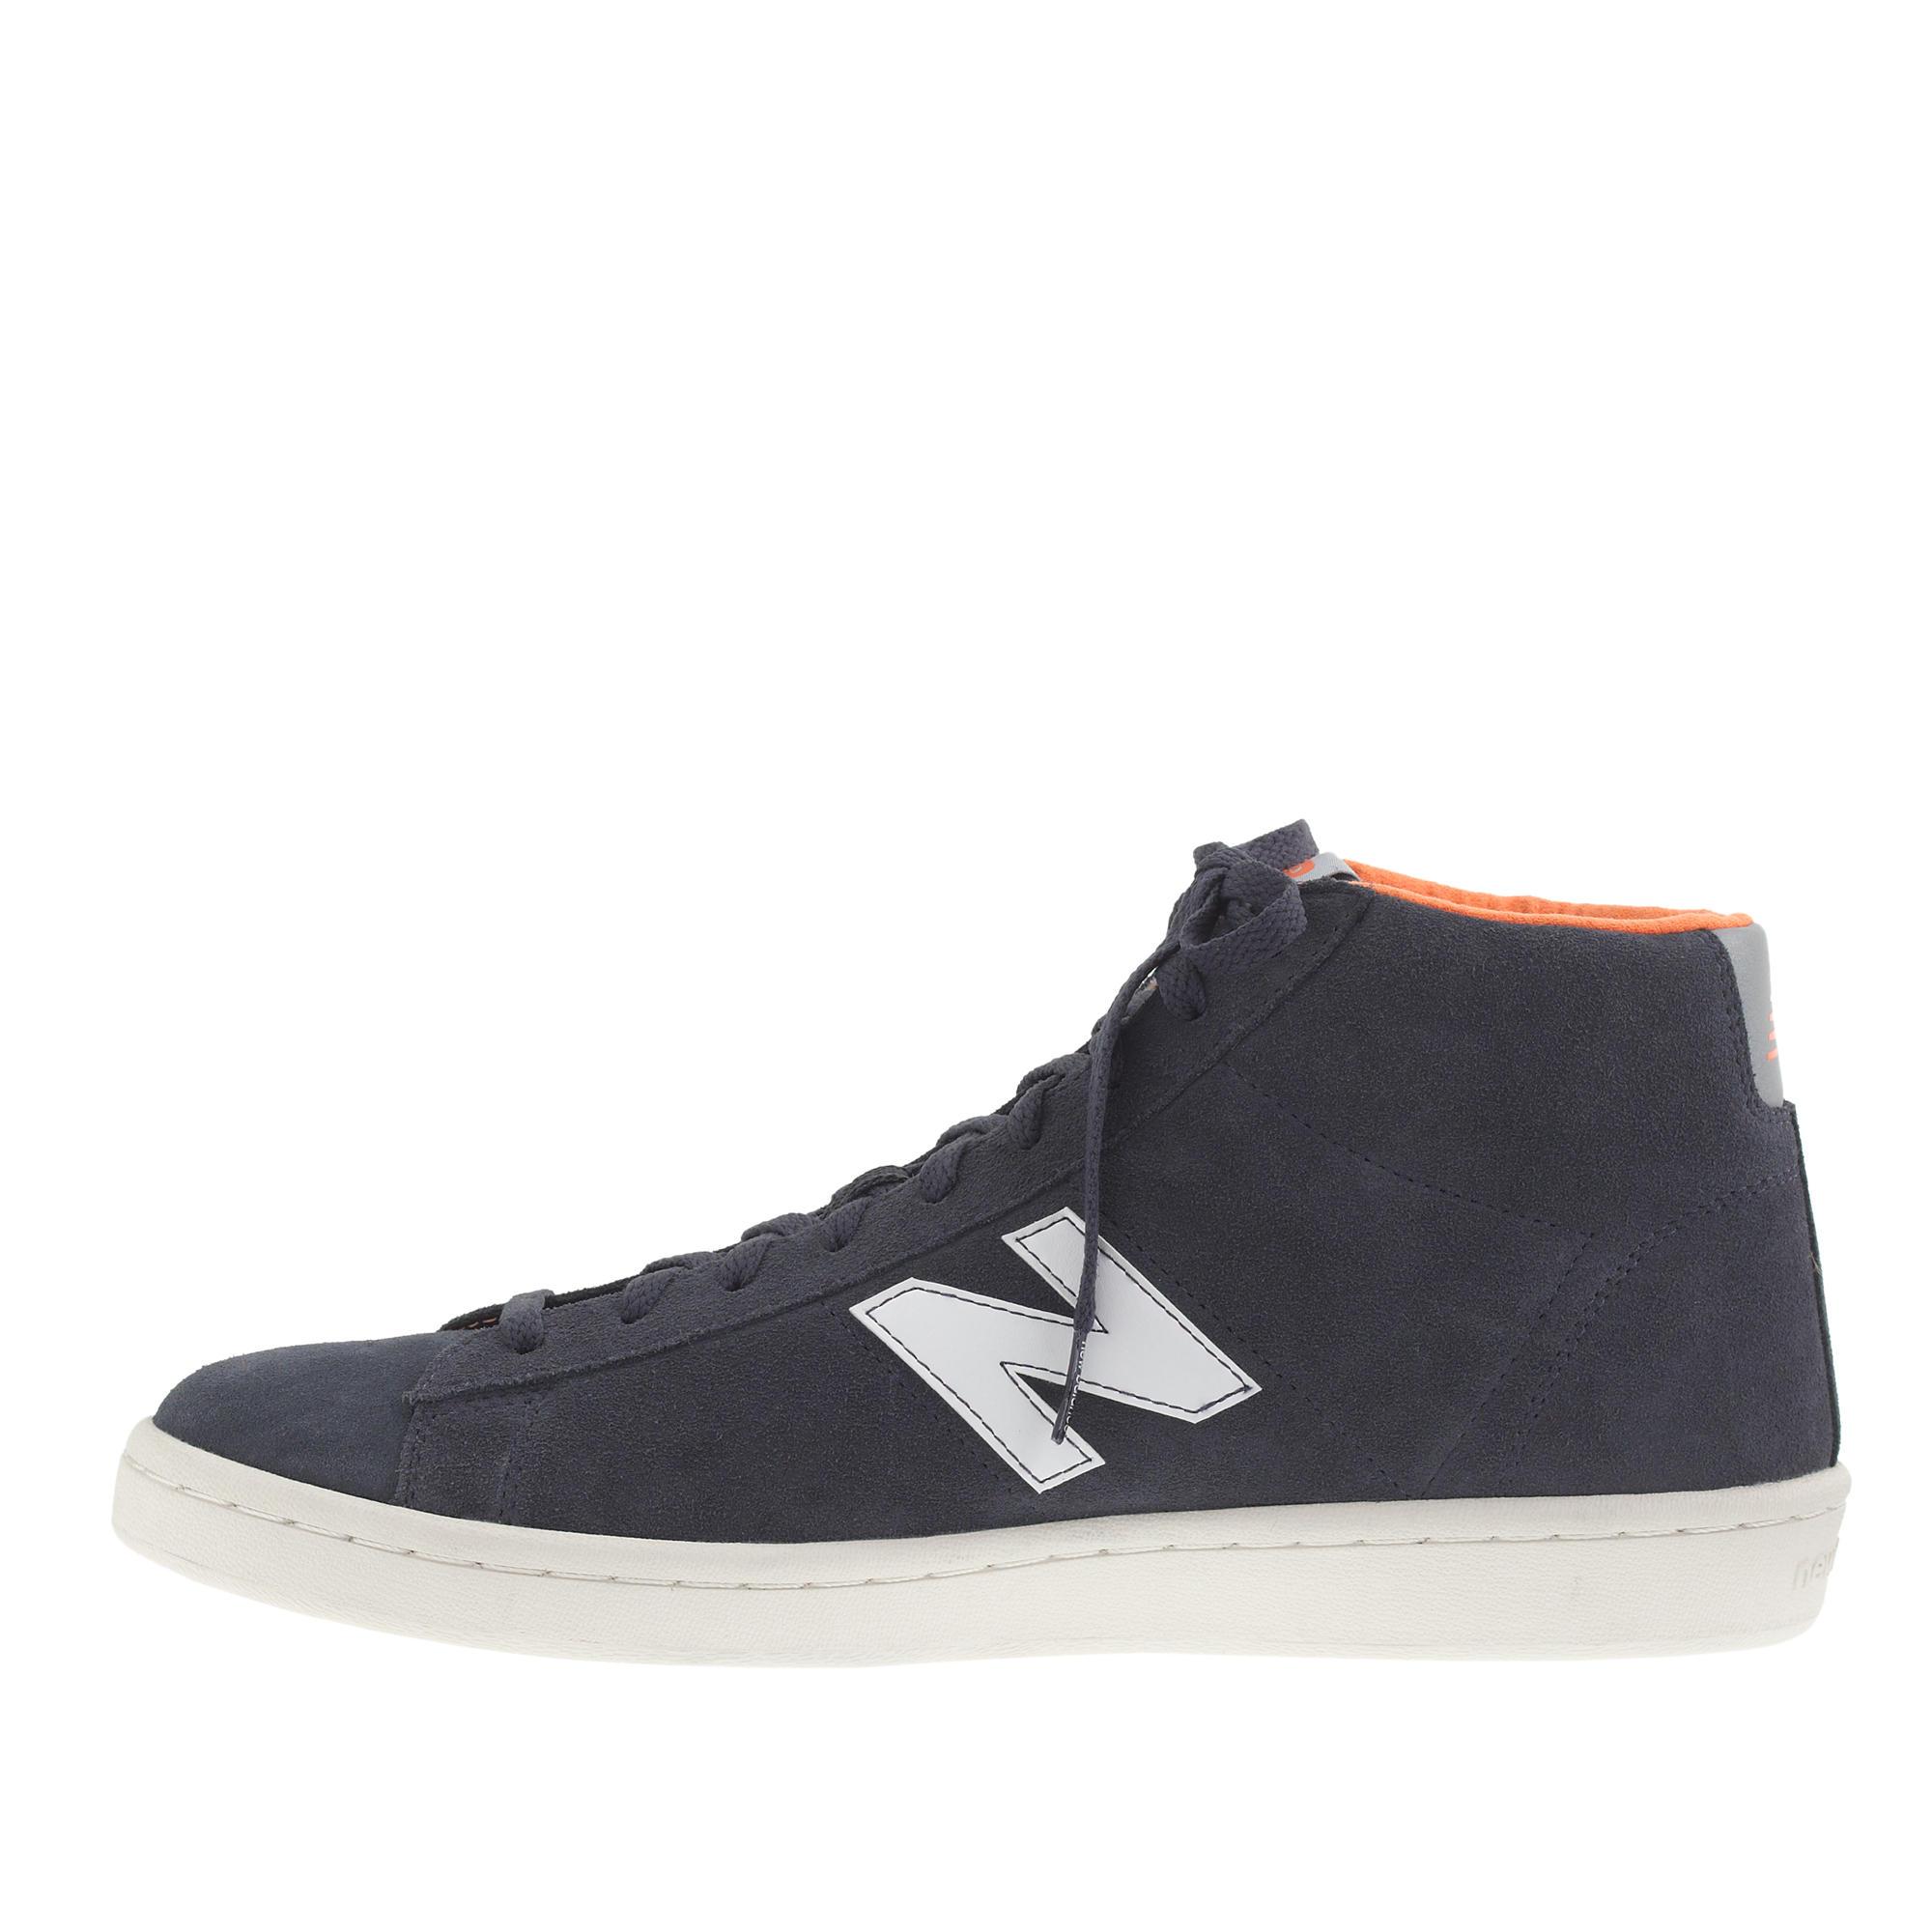 huge selection of 8448f 384af Blue Men'S New Balance® 891 High-Top Sneakers